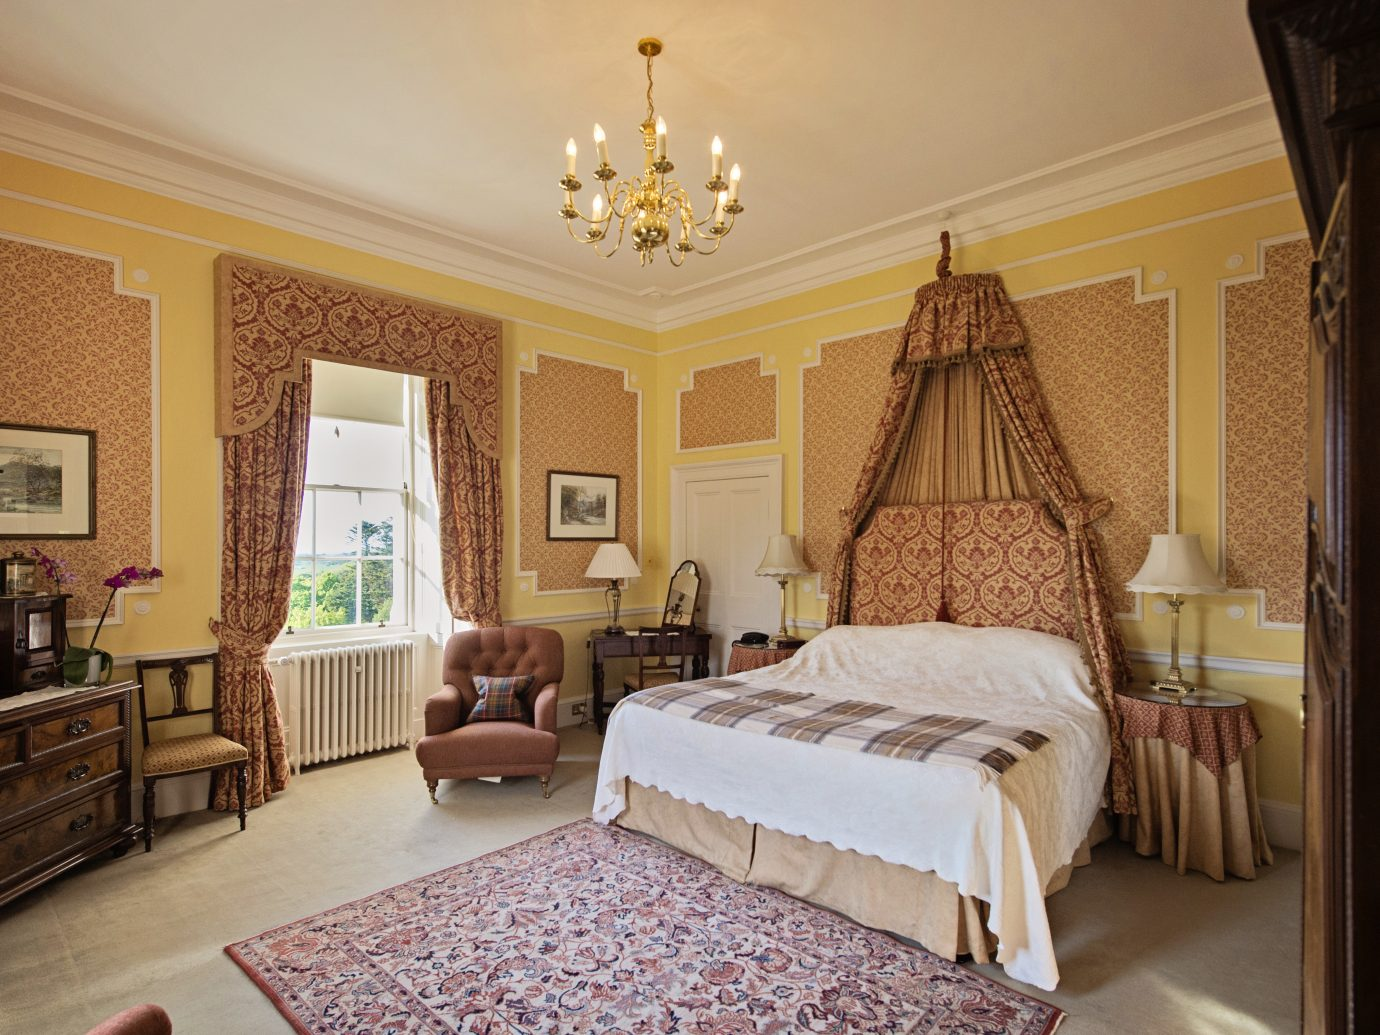 Bedroom at Glennapp Castle